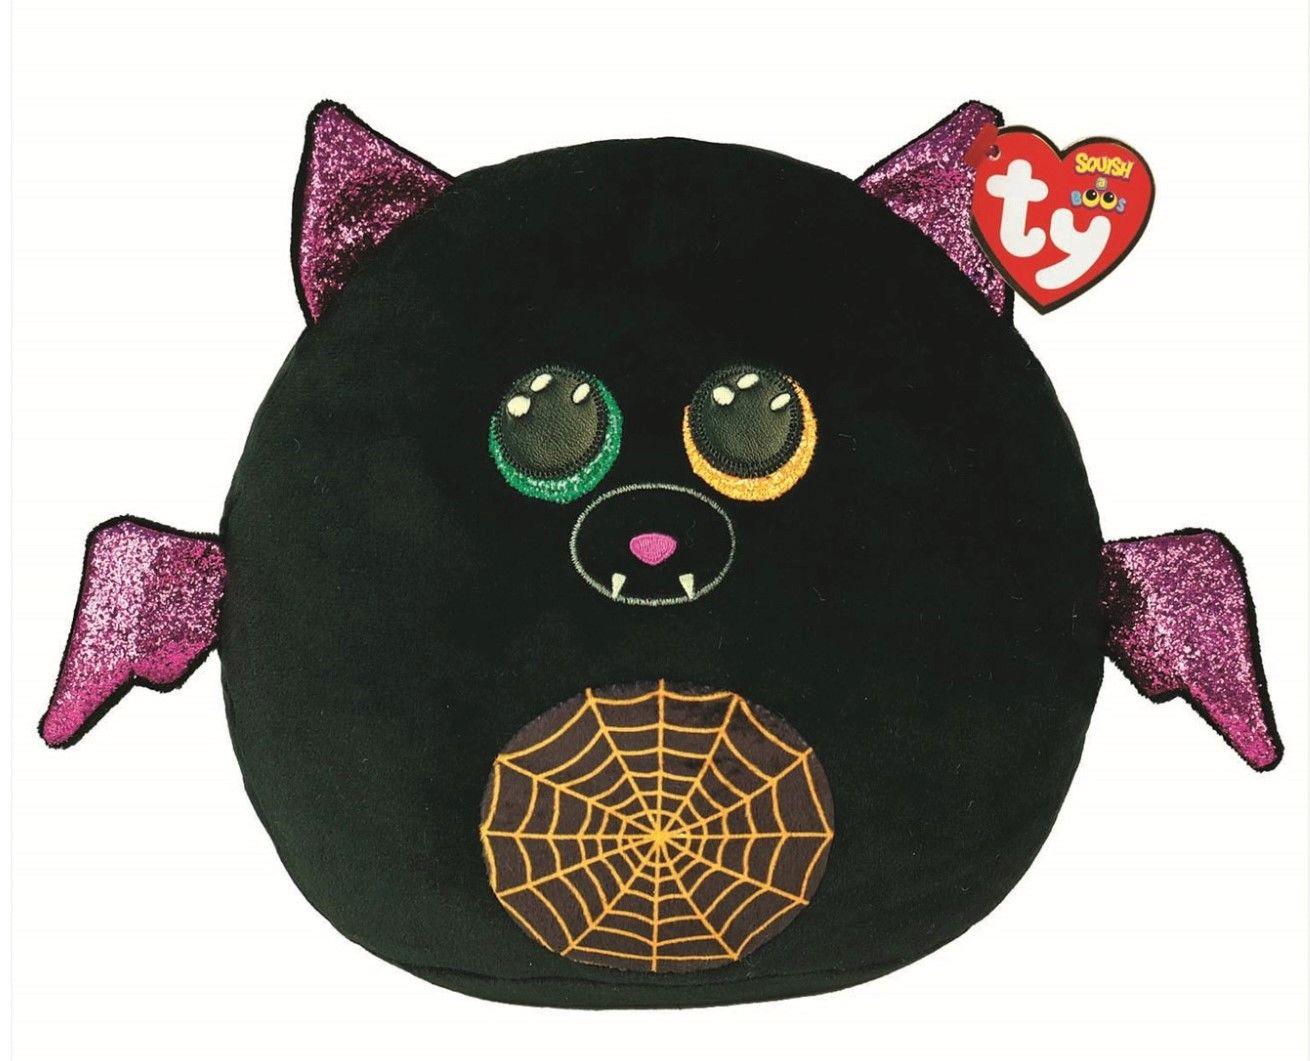 "Ty Eerie Halloween Bat Squish-a-boo 14"" 39209"